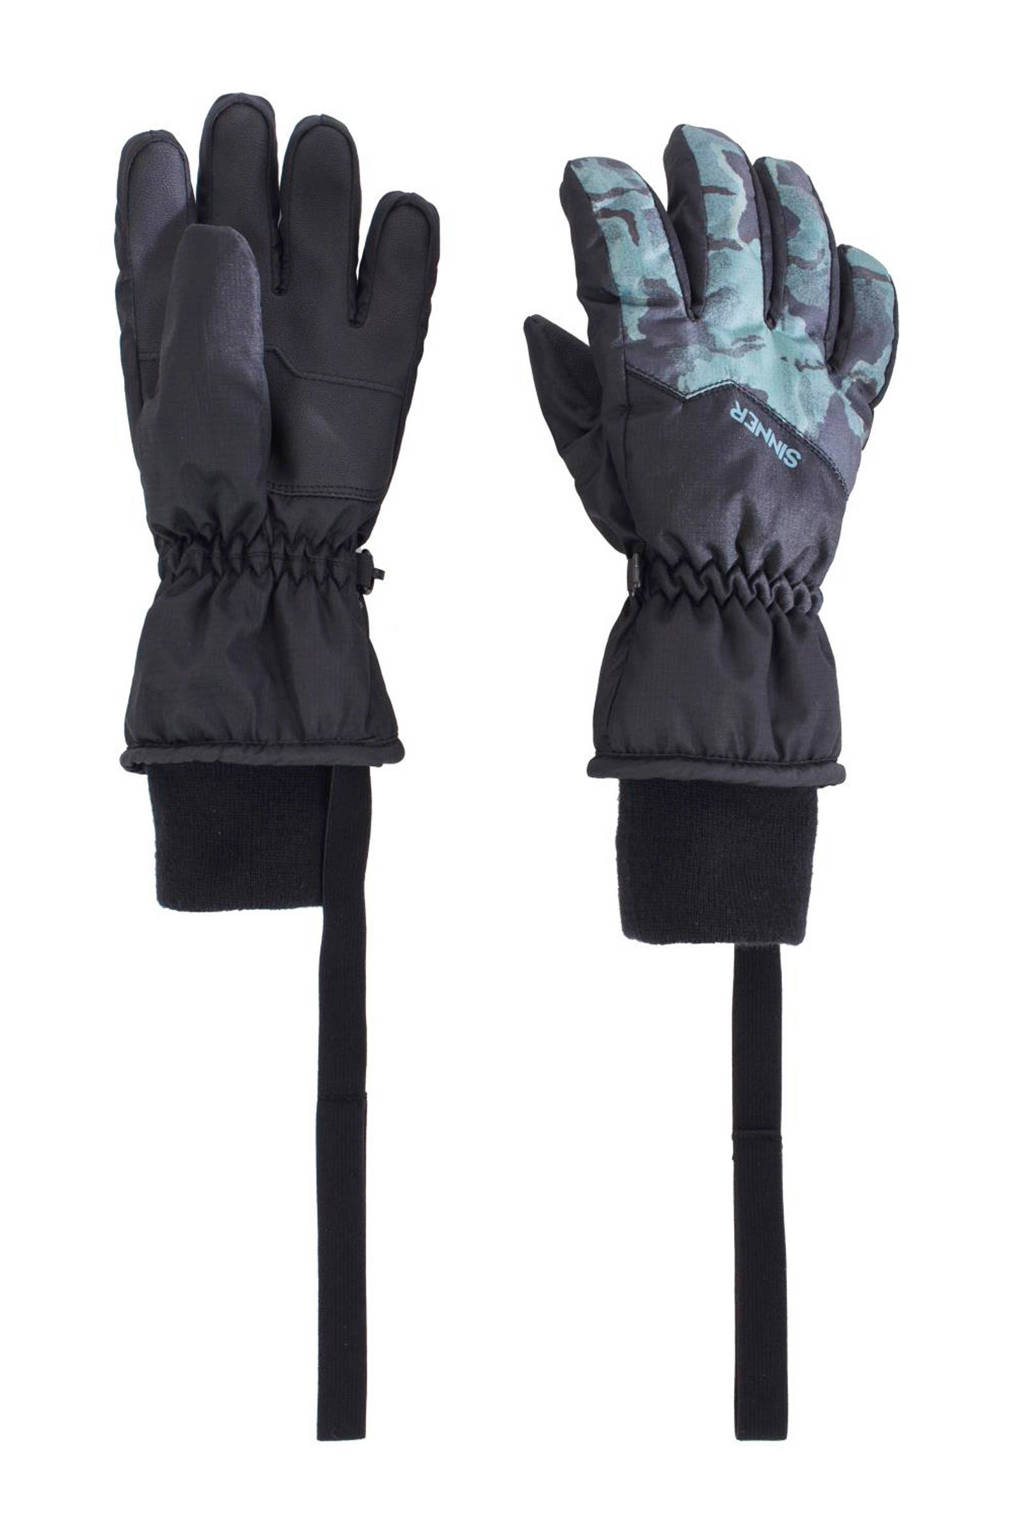 Sinner skihandschoenen Phoebe Jr. zwart/groen, Zwart